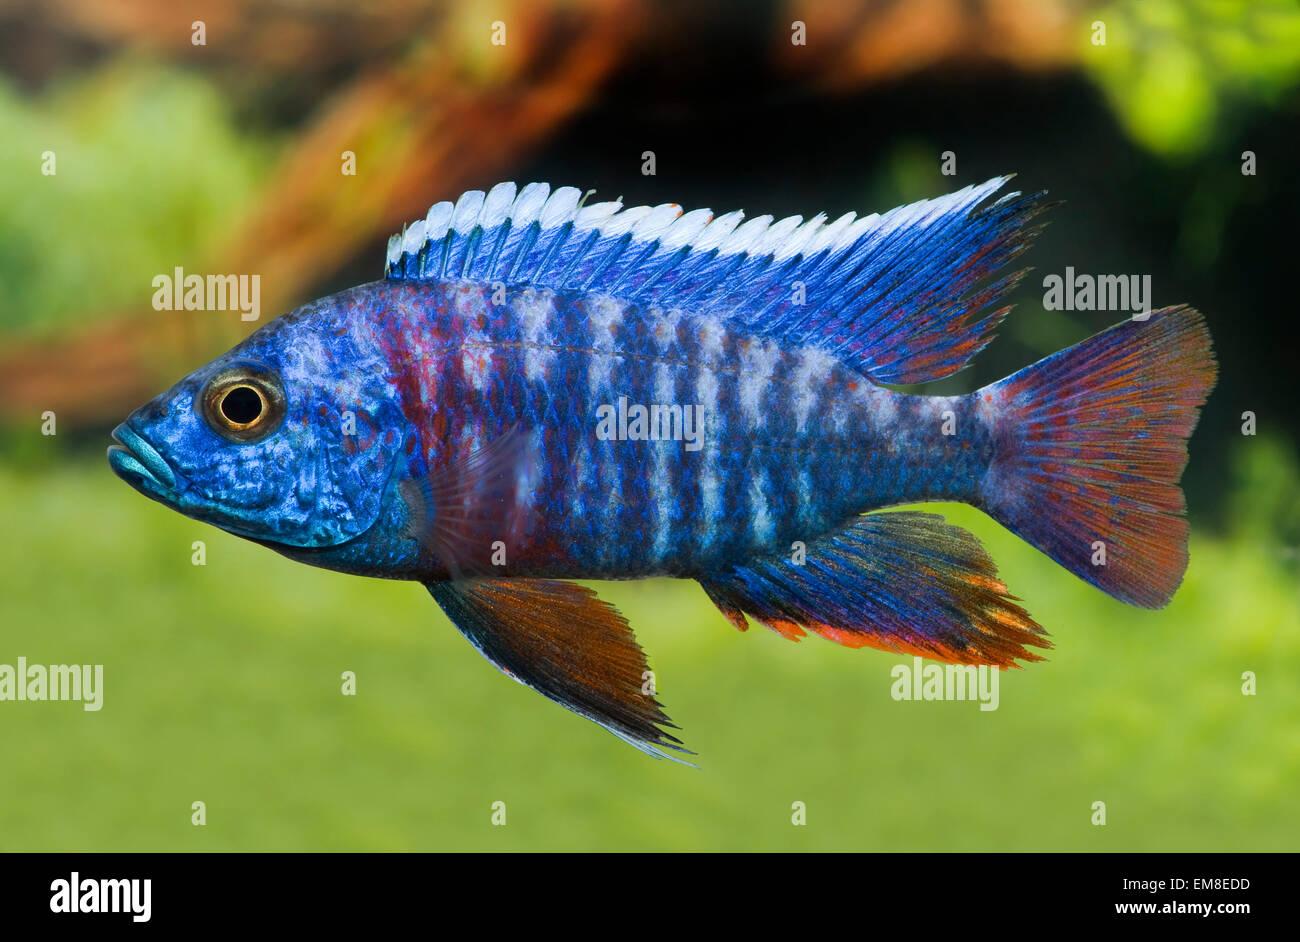 Aulonocara stuartgranti,Grants Malawi-Buntbarsch,Grant's Malawi-Cichlid Stock Photo